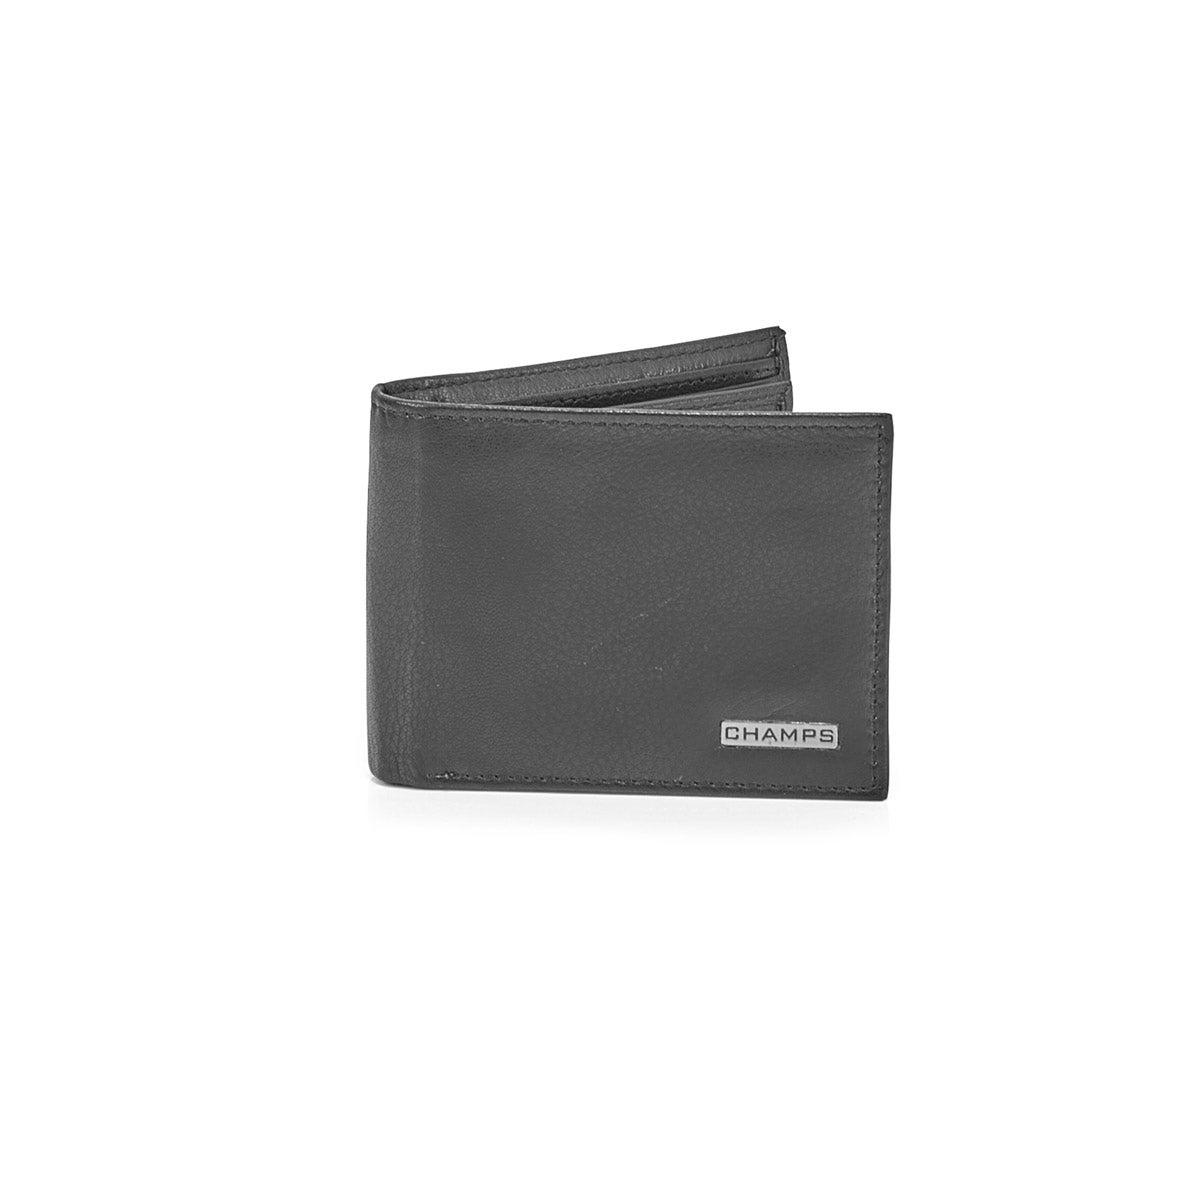 Men's MW-803-BLK cowhide leather wallets